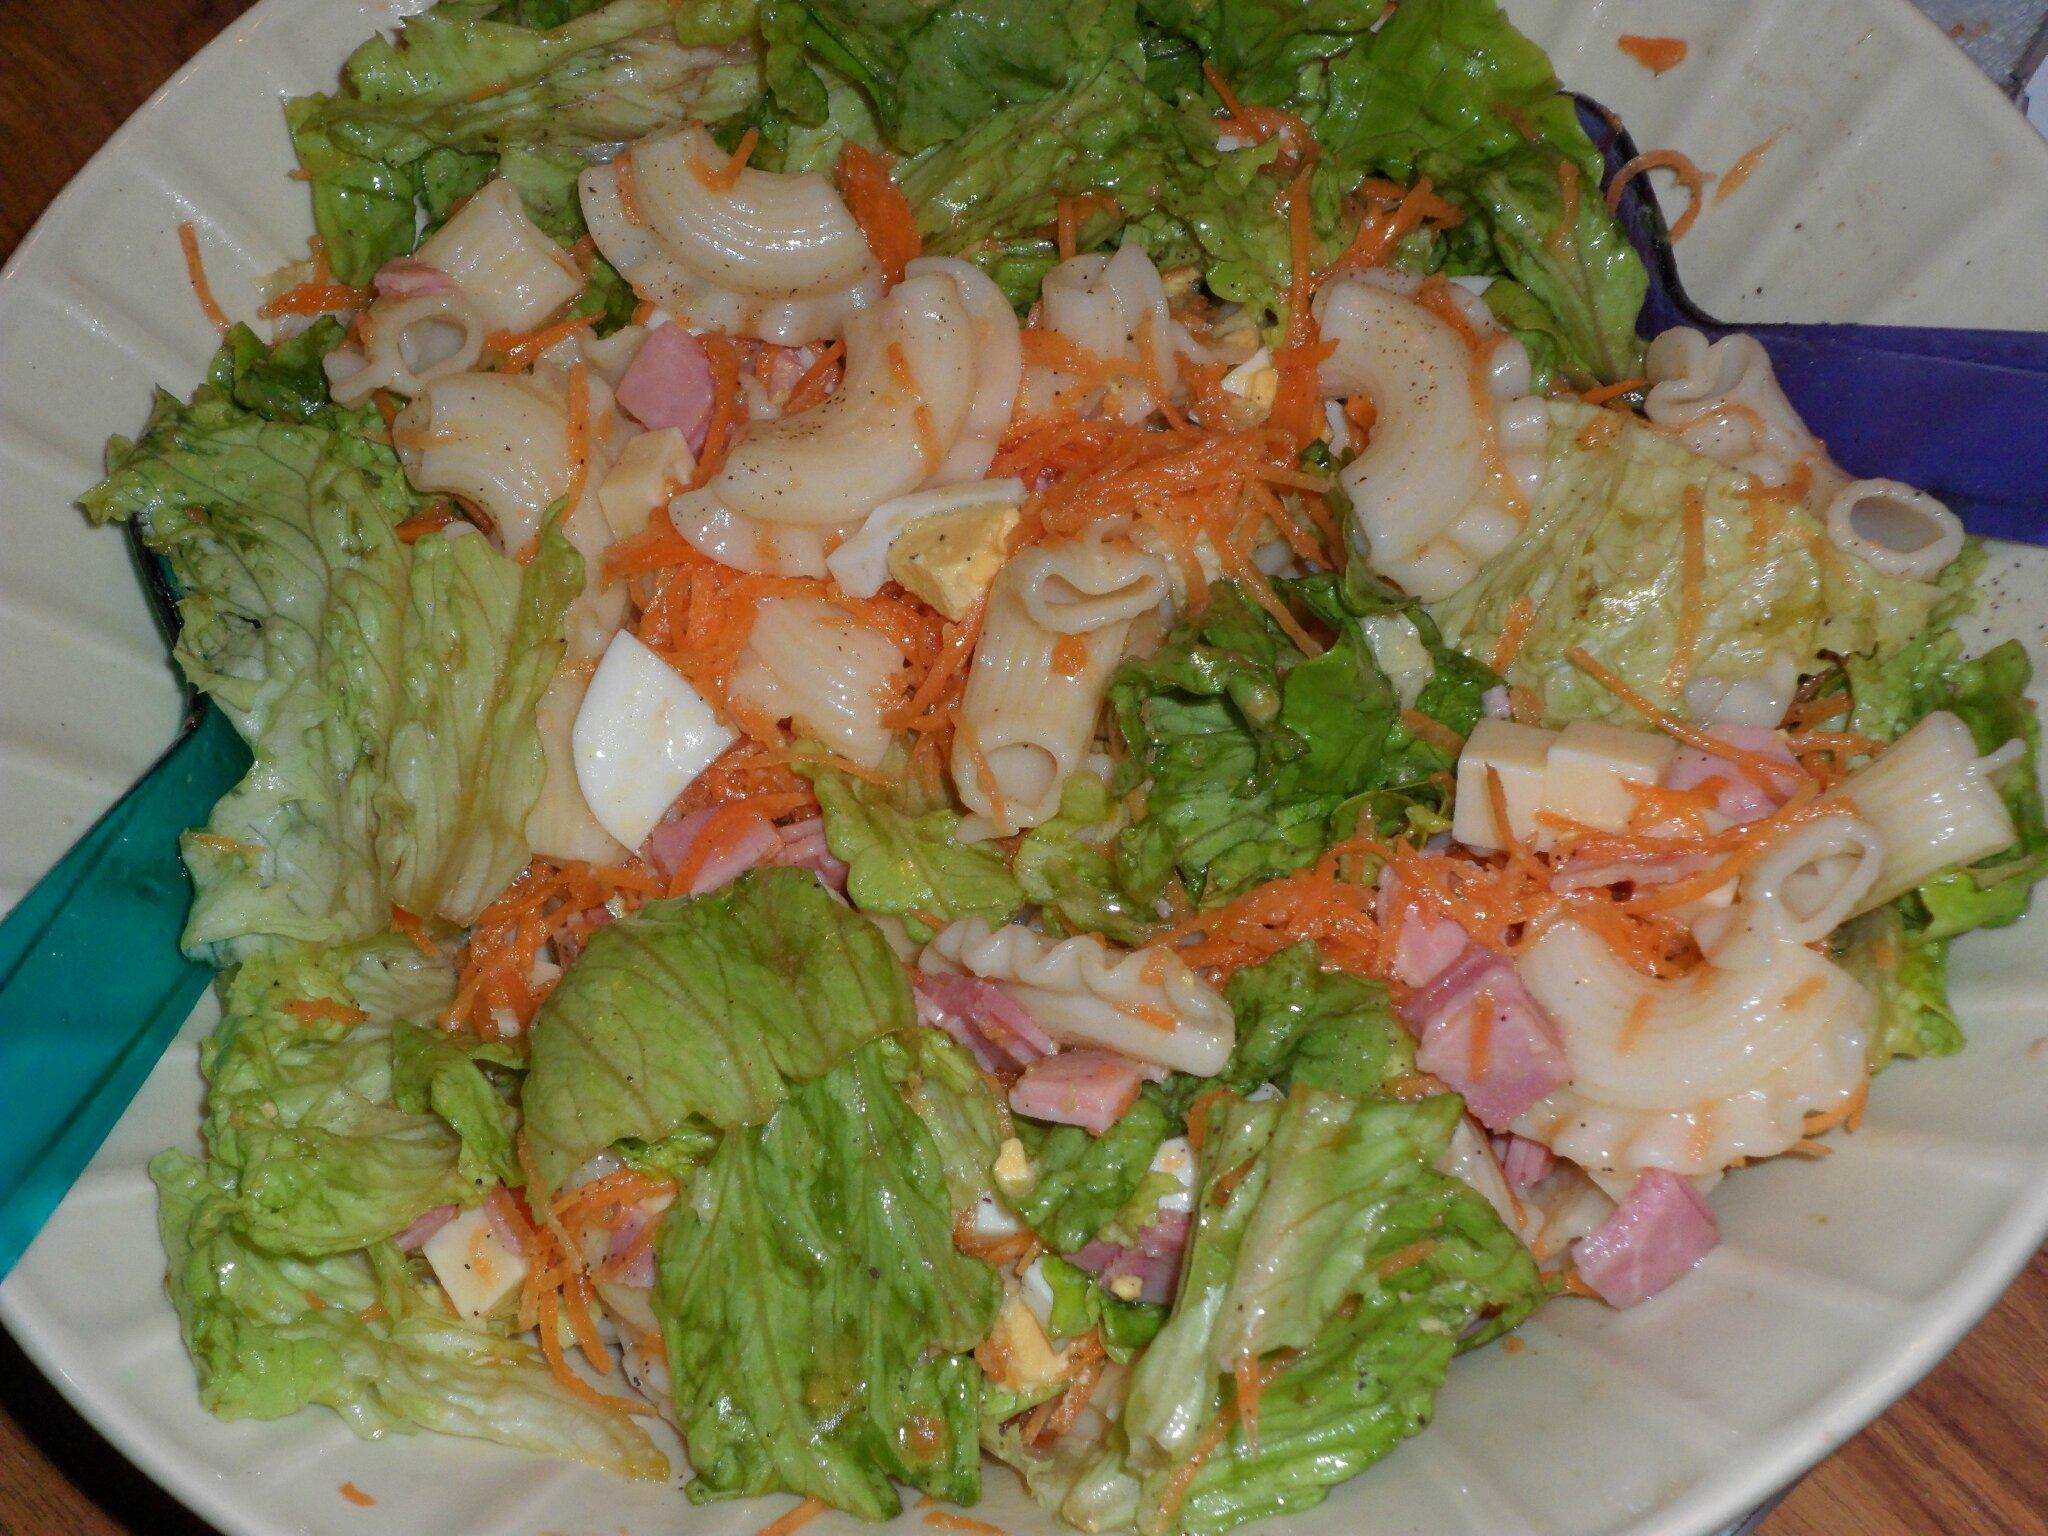 salade de p 226 tes jambon emmental crudit 233 s miam miam